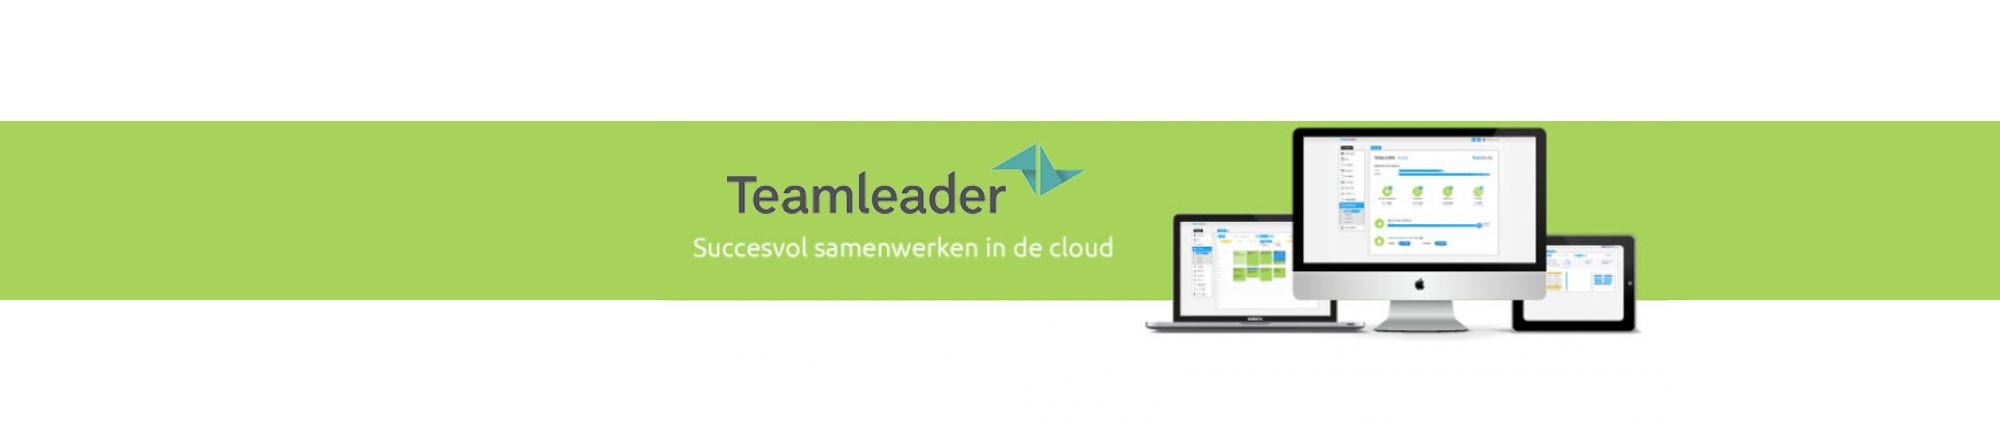 https://dpyxfisjd0mft.cloudfront.net/lab9-2/B2B/Sliders_B2B/ERP-CRM/BannerTeamleader.jpg?1455271159&w=2000&h=425